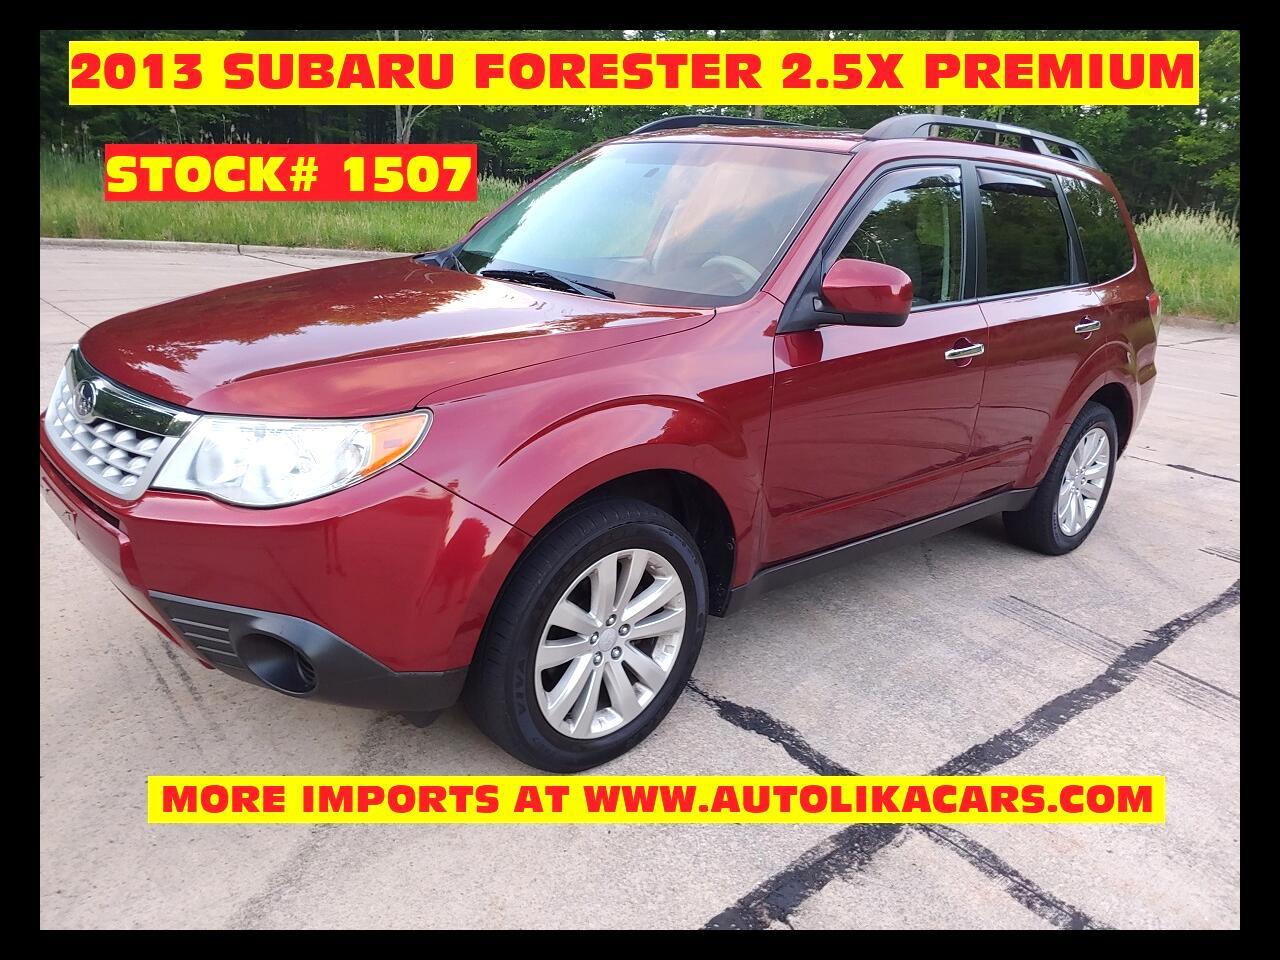 Subaru Forester 4dr Auto 2.5X Premium 2013